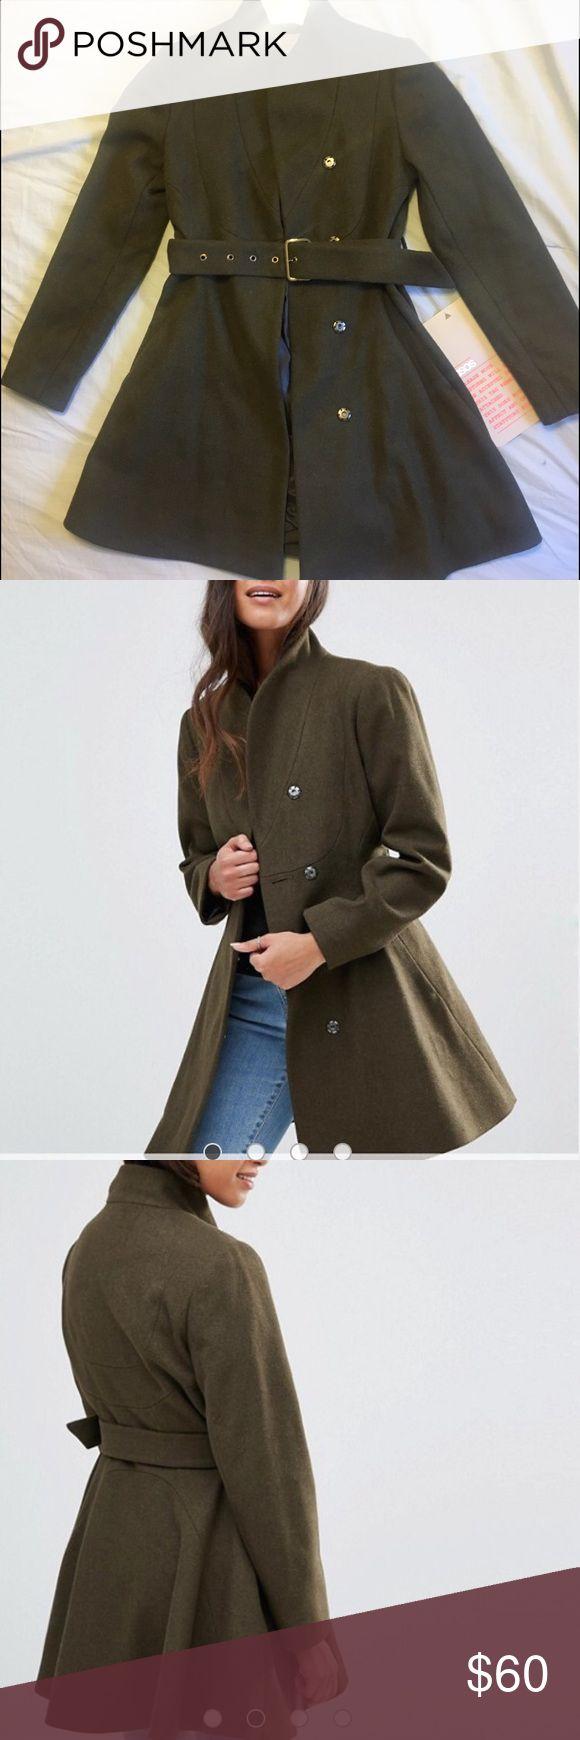 Winter coat ASOS Petite Khaki Green Winter Coat. Never worn. ASOS Petite Jackets & Coats Pea Coats